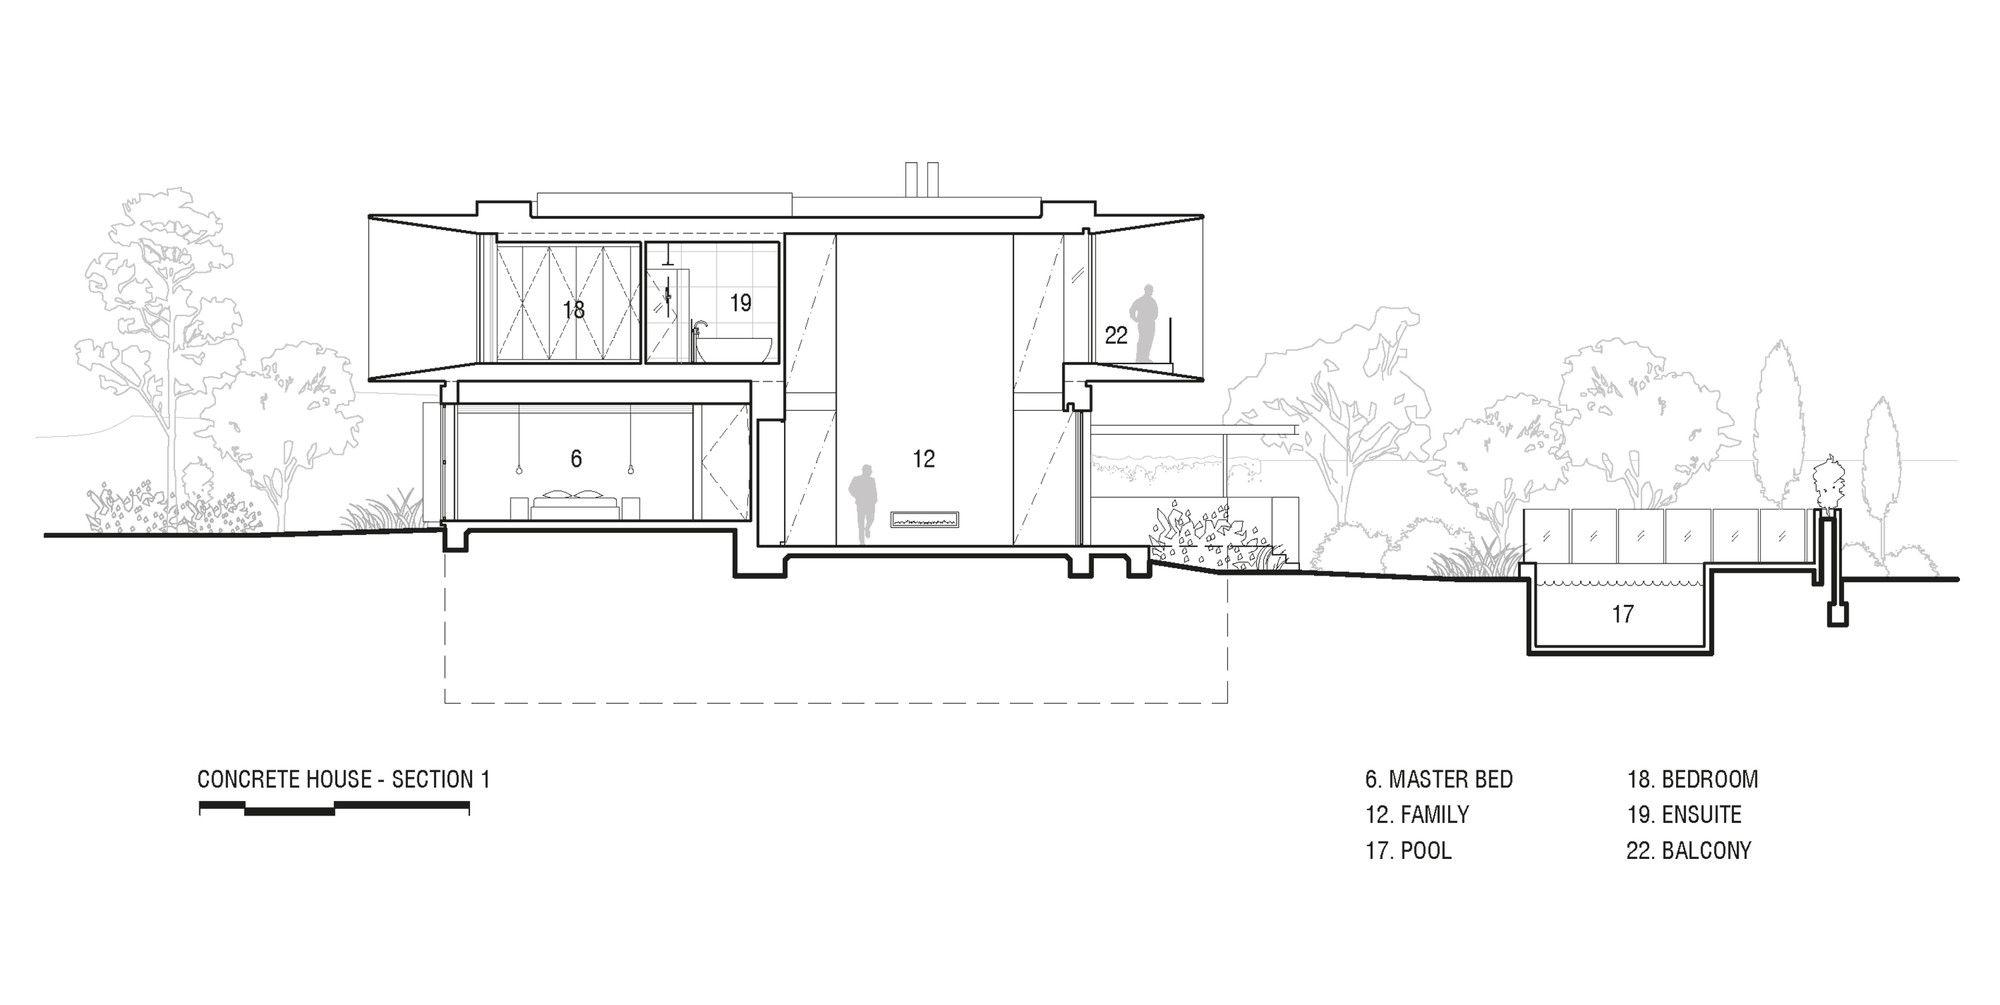 Gallery Of Concrete House Matt Gibson Architecture 24 Concrete House Architecture Concrete Houses